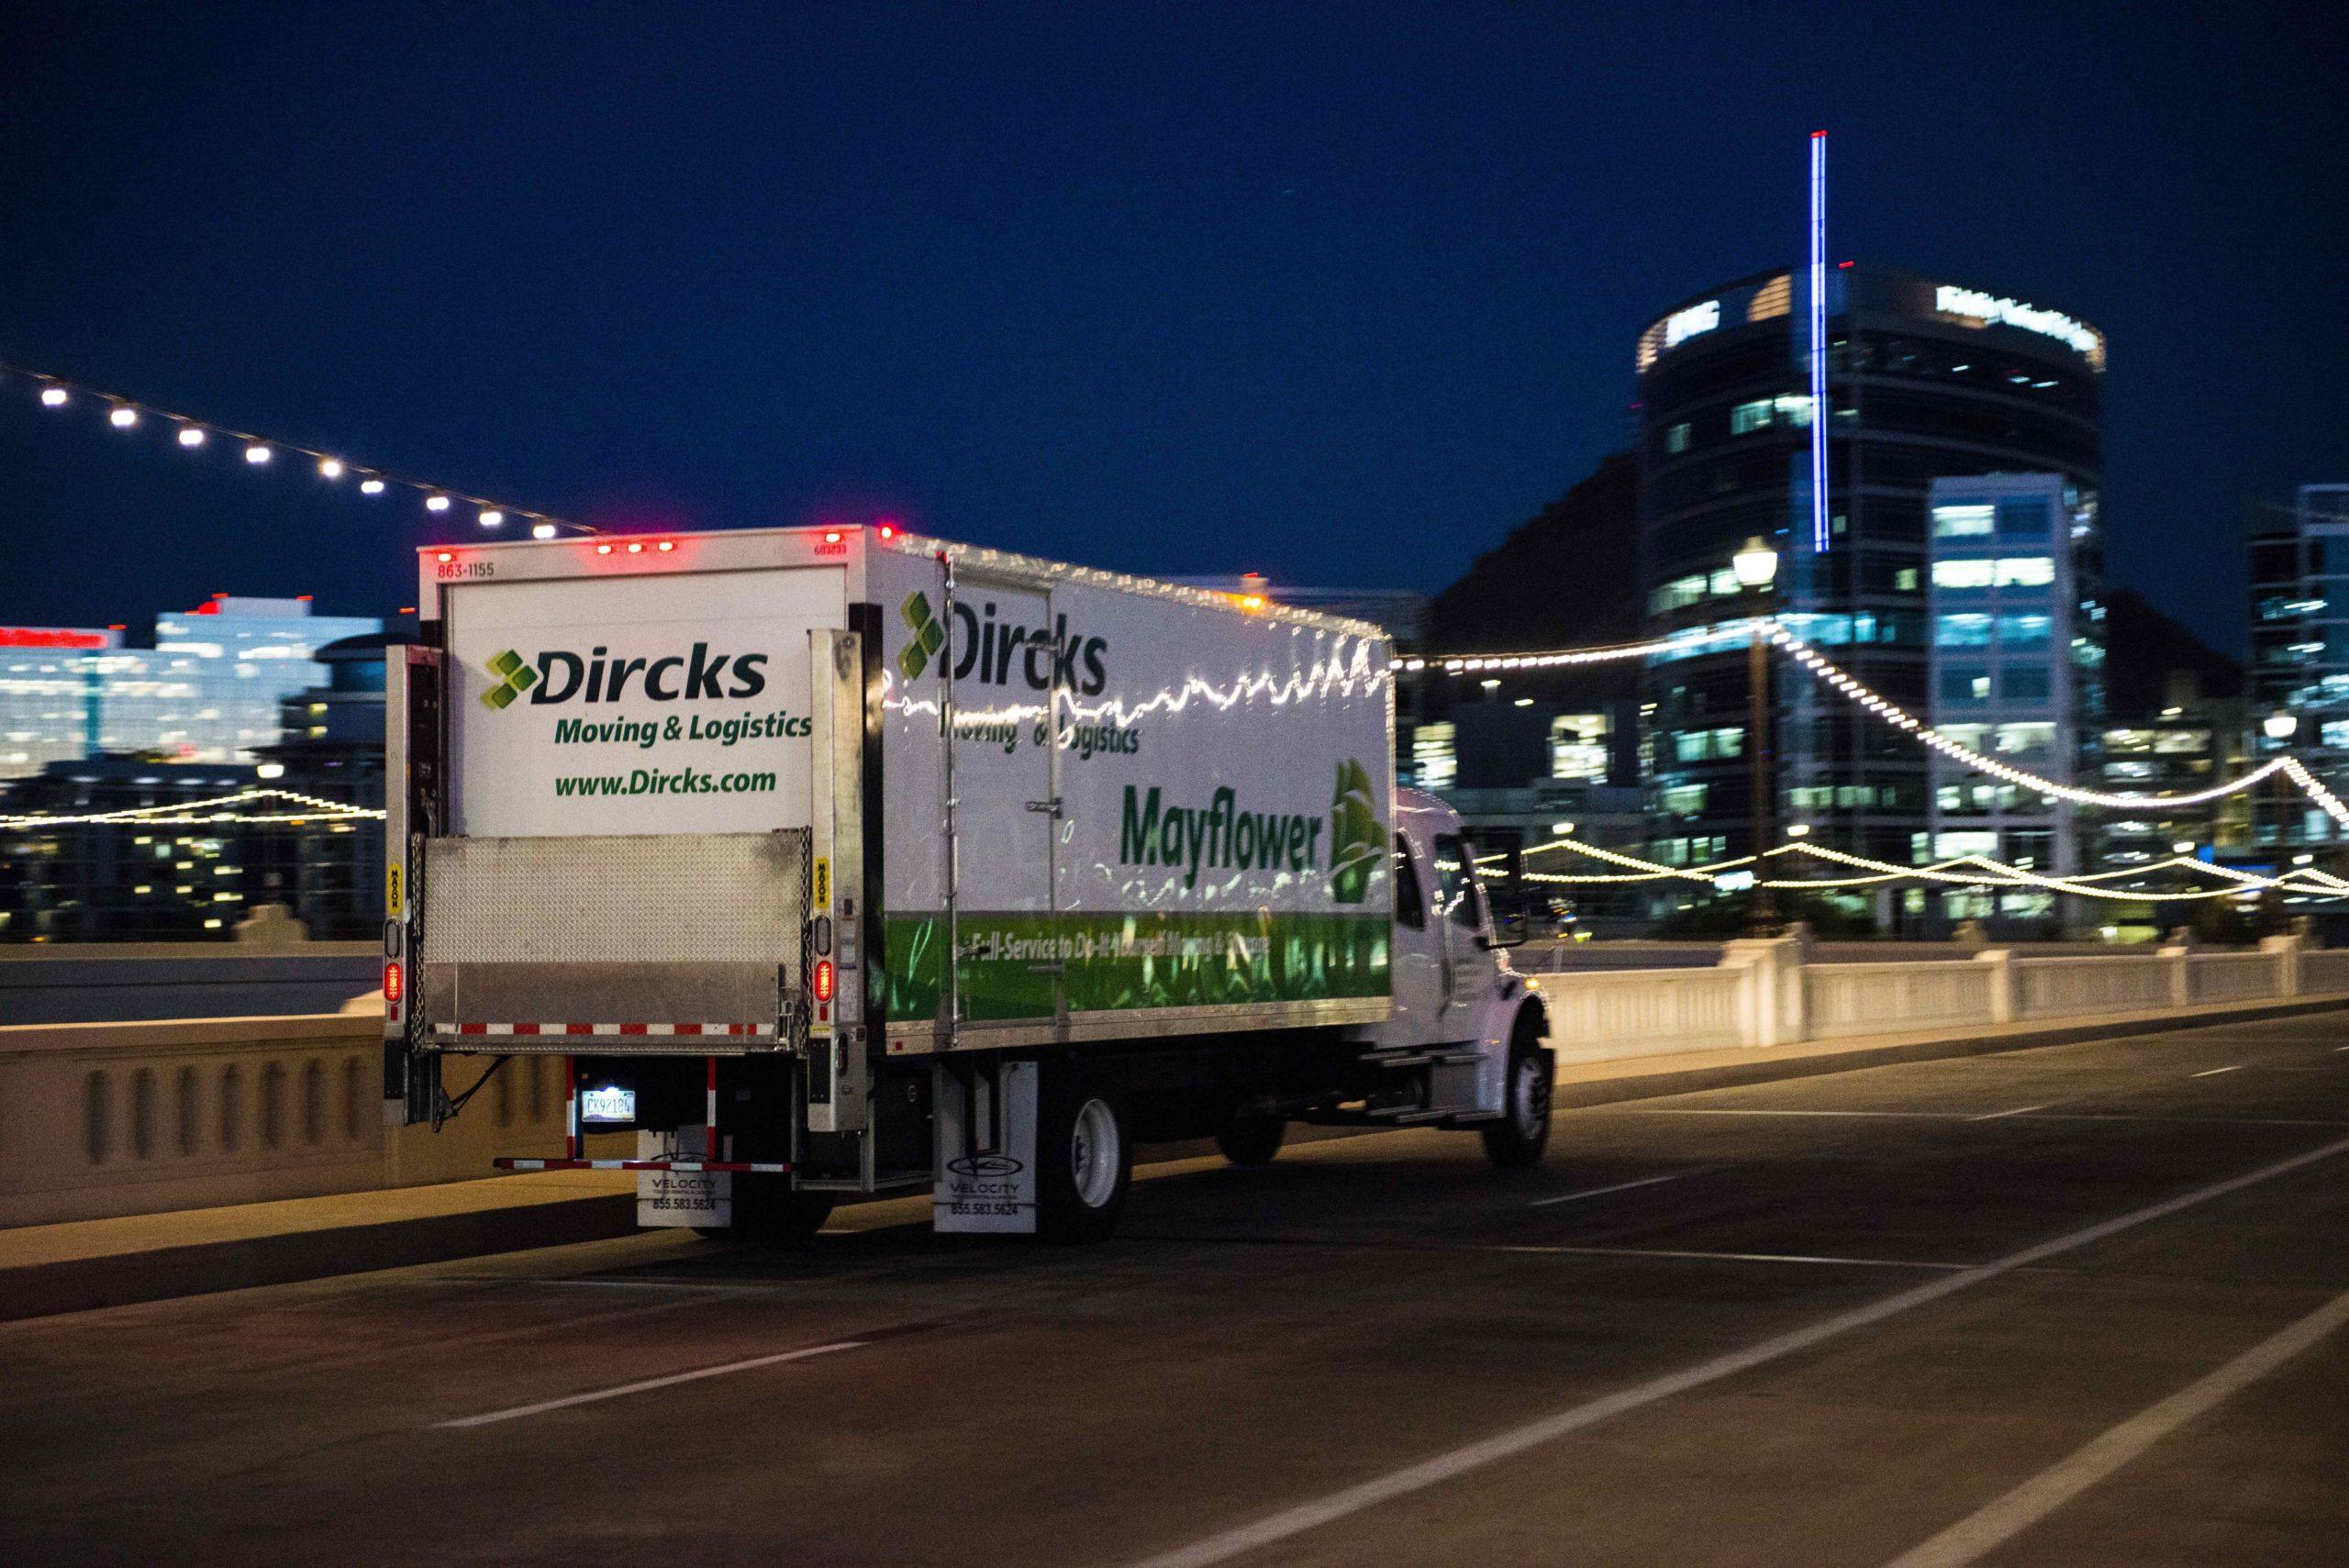 dircks truck driving at night